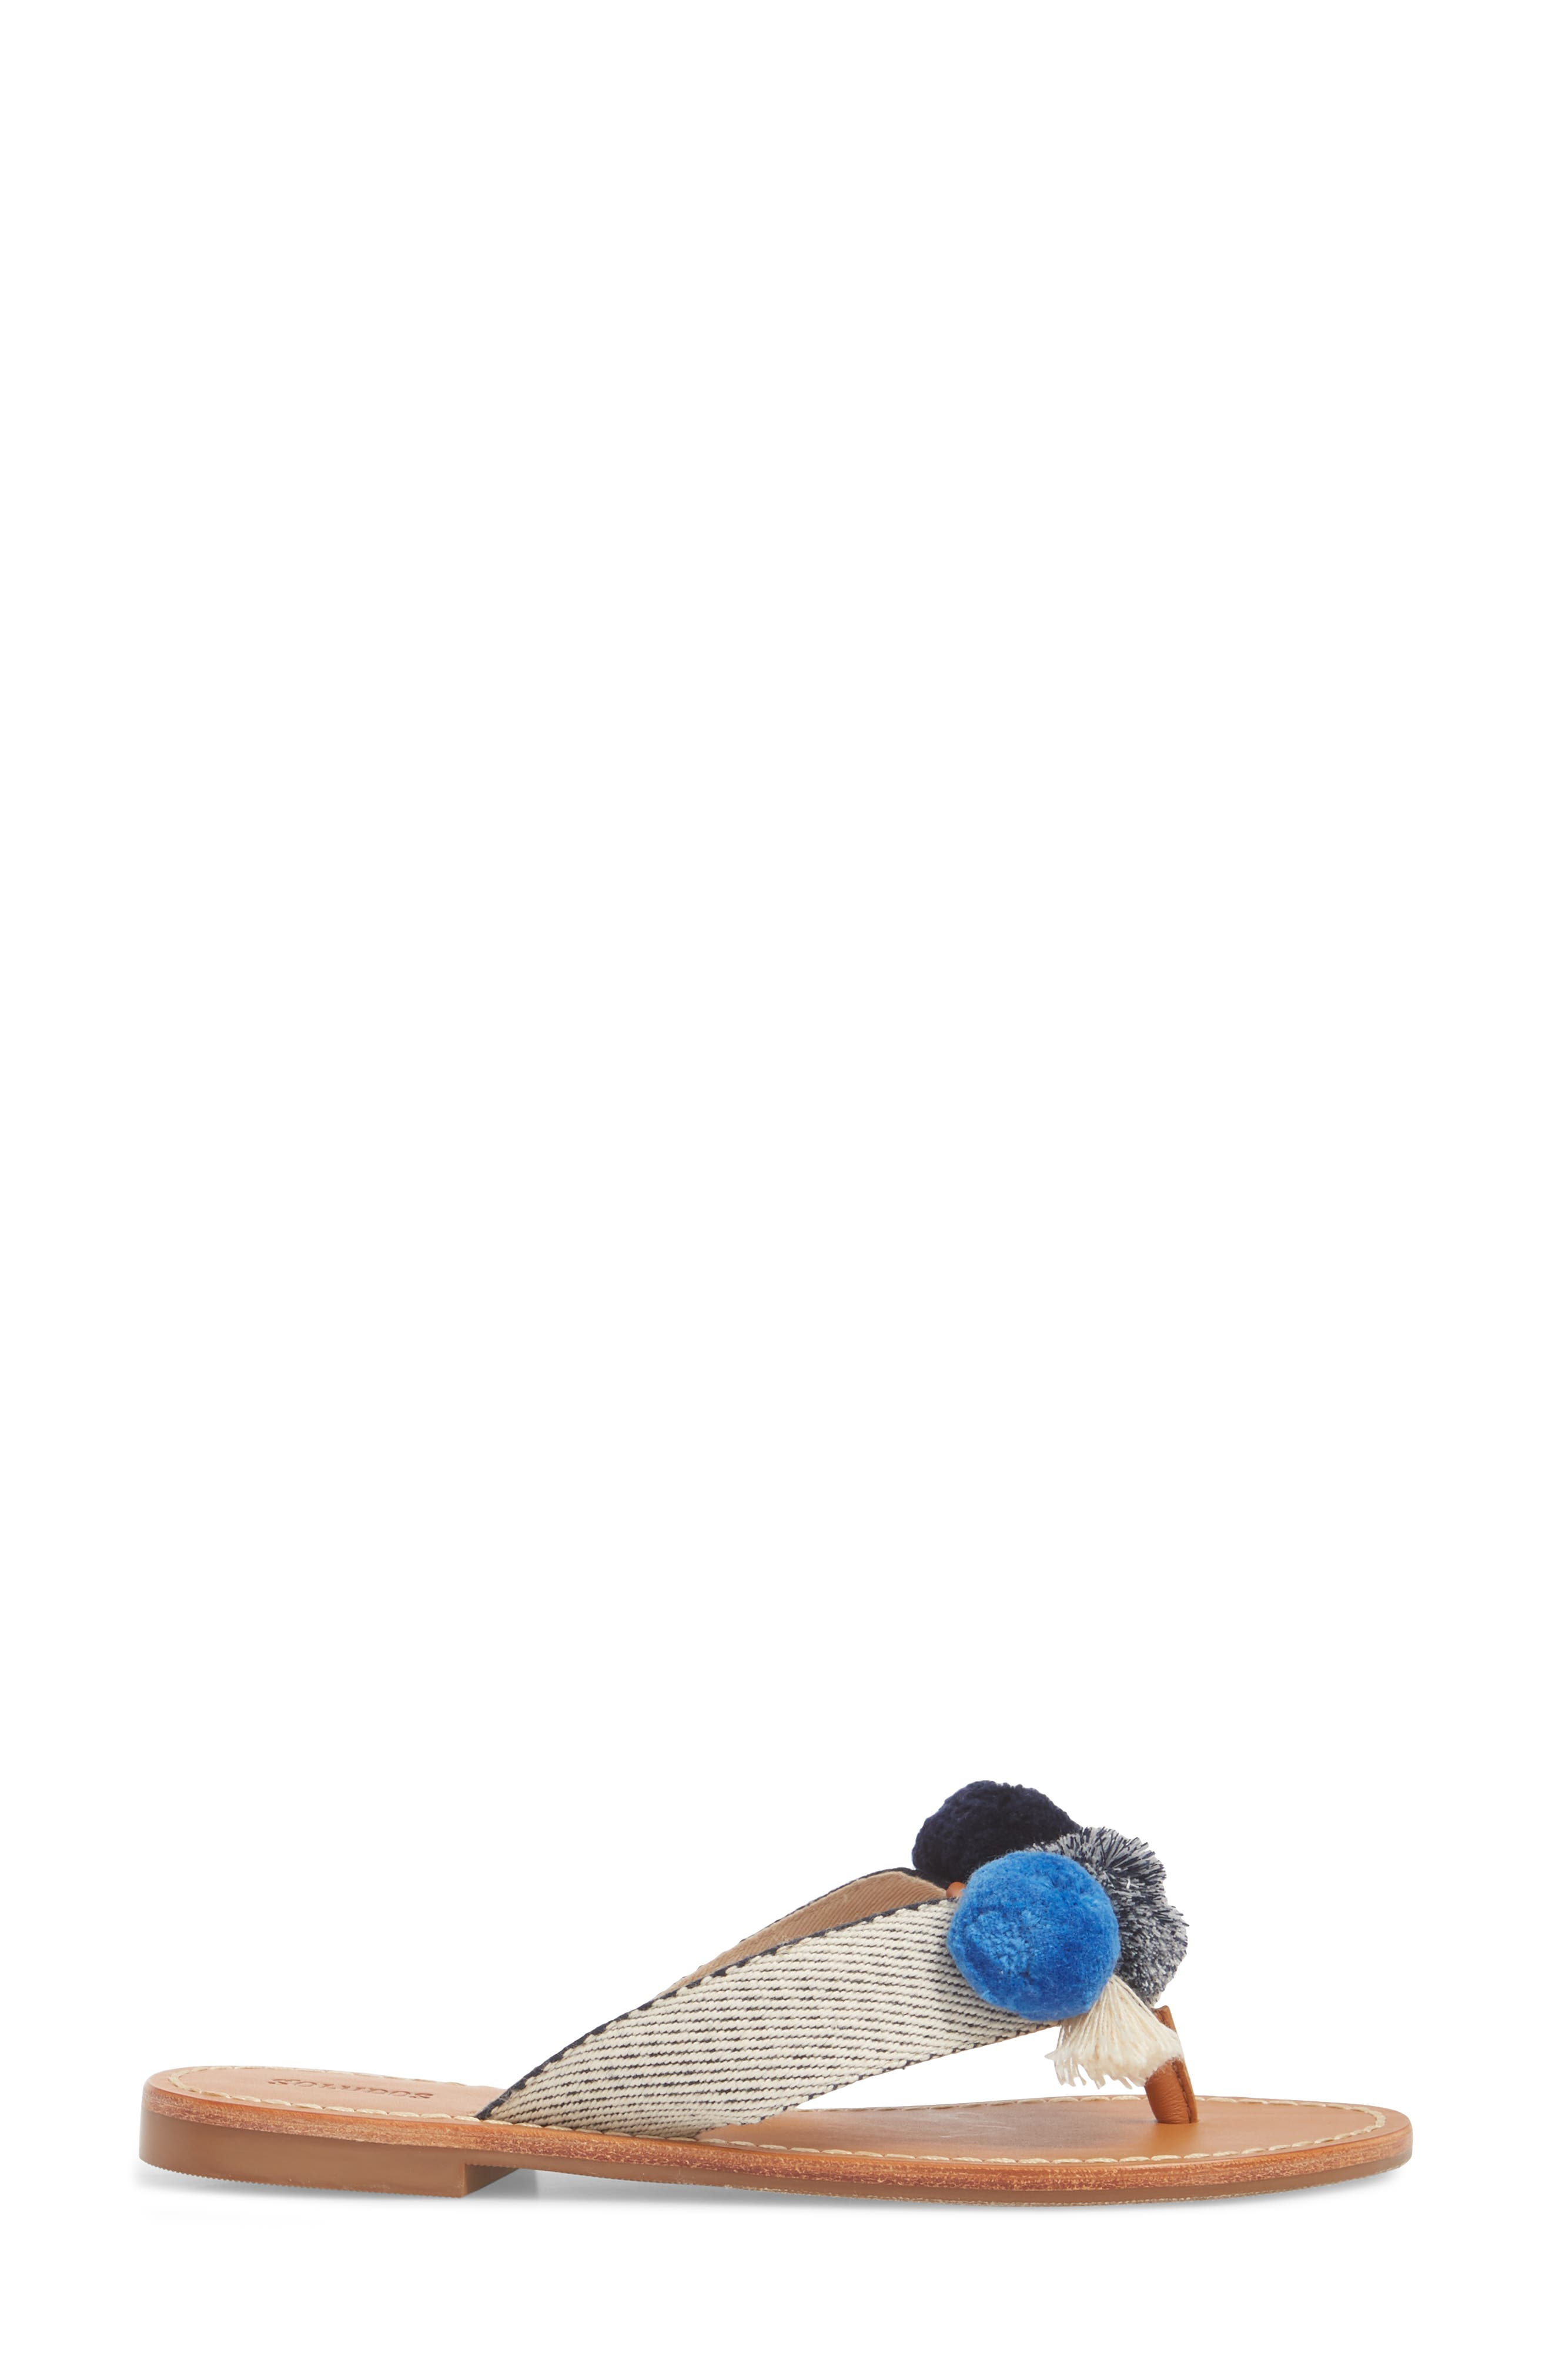 Capri Pompom Flip Flop,                             Alternate thumbnail 3, color,                             Navy/ Natural